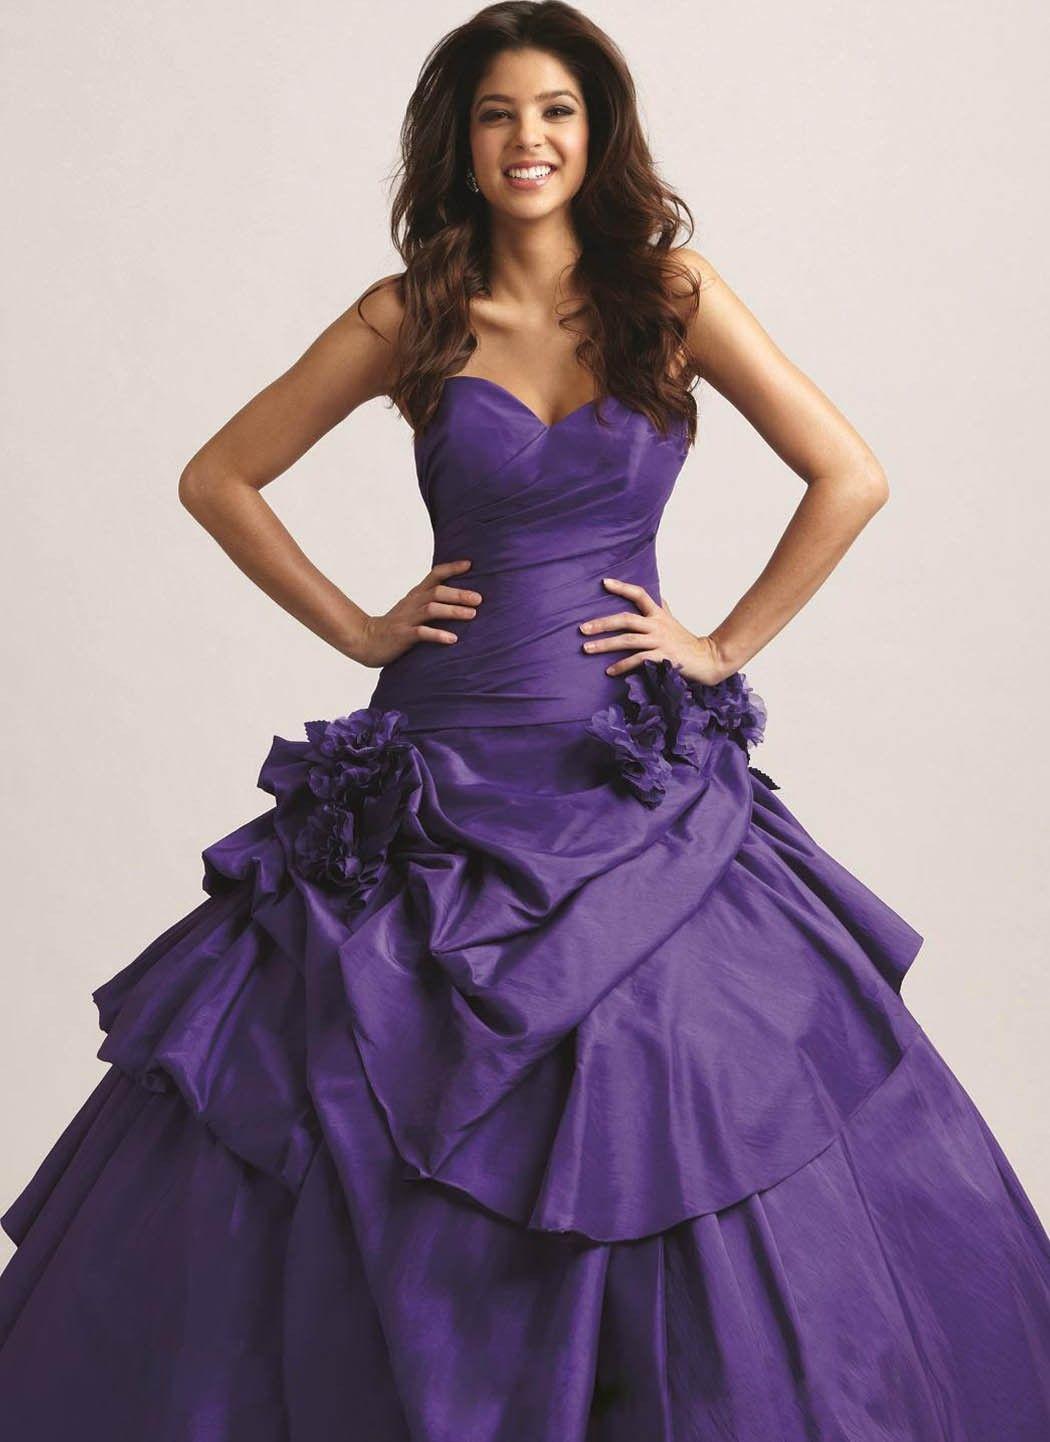 lavender wedding dresses gallery | ... -quinceanera-dressrent-a ...